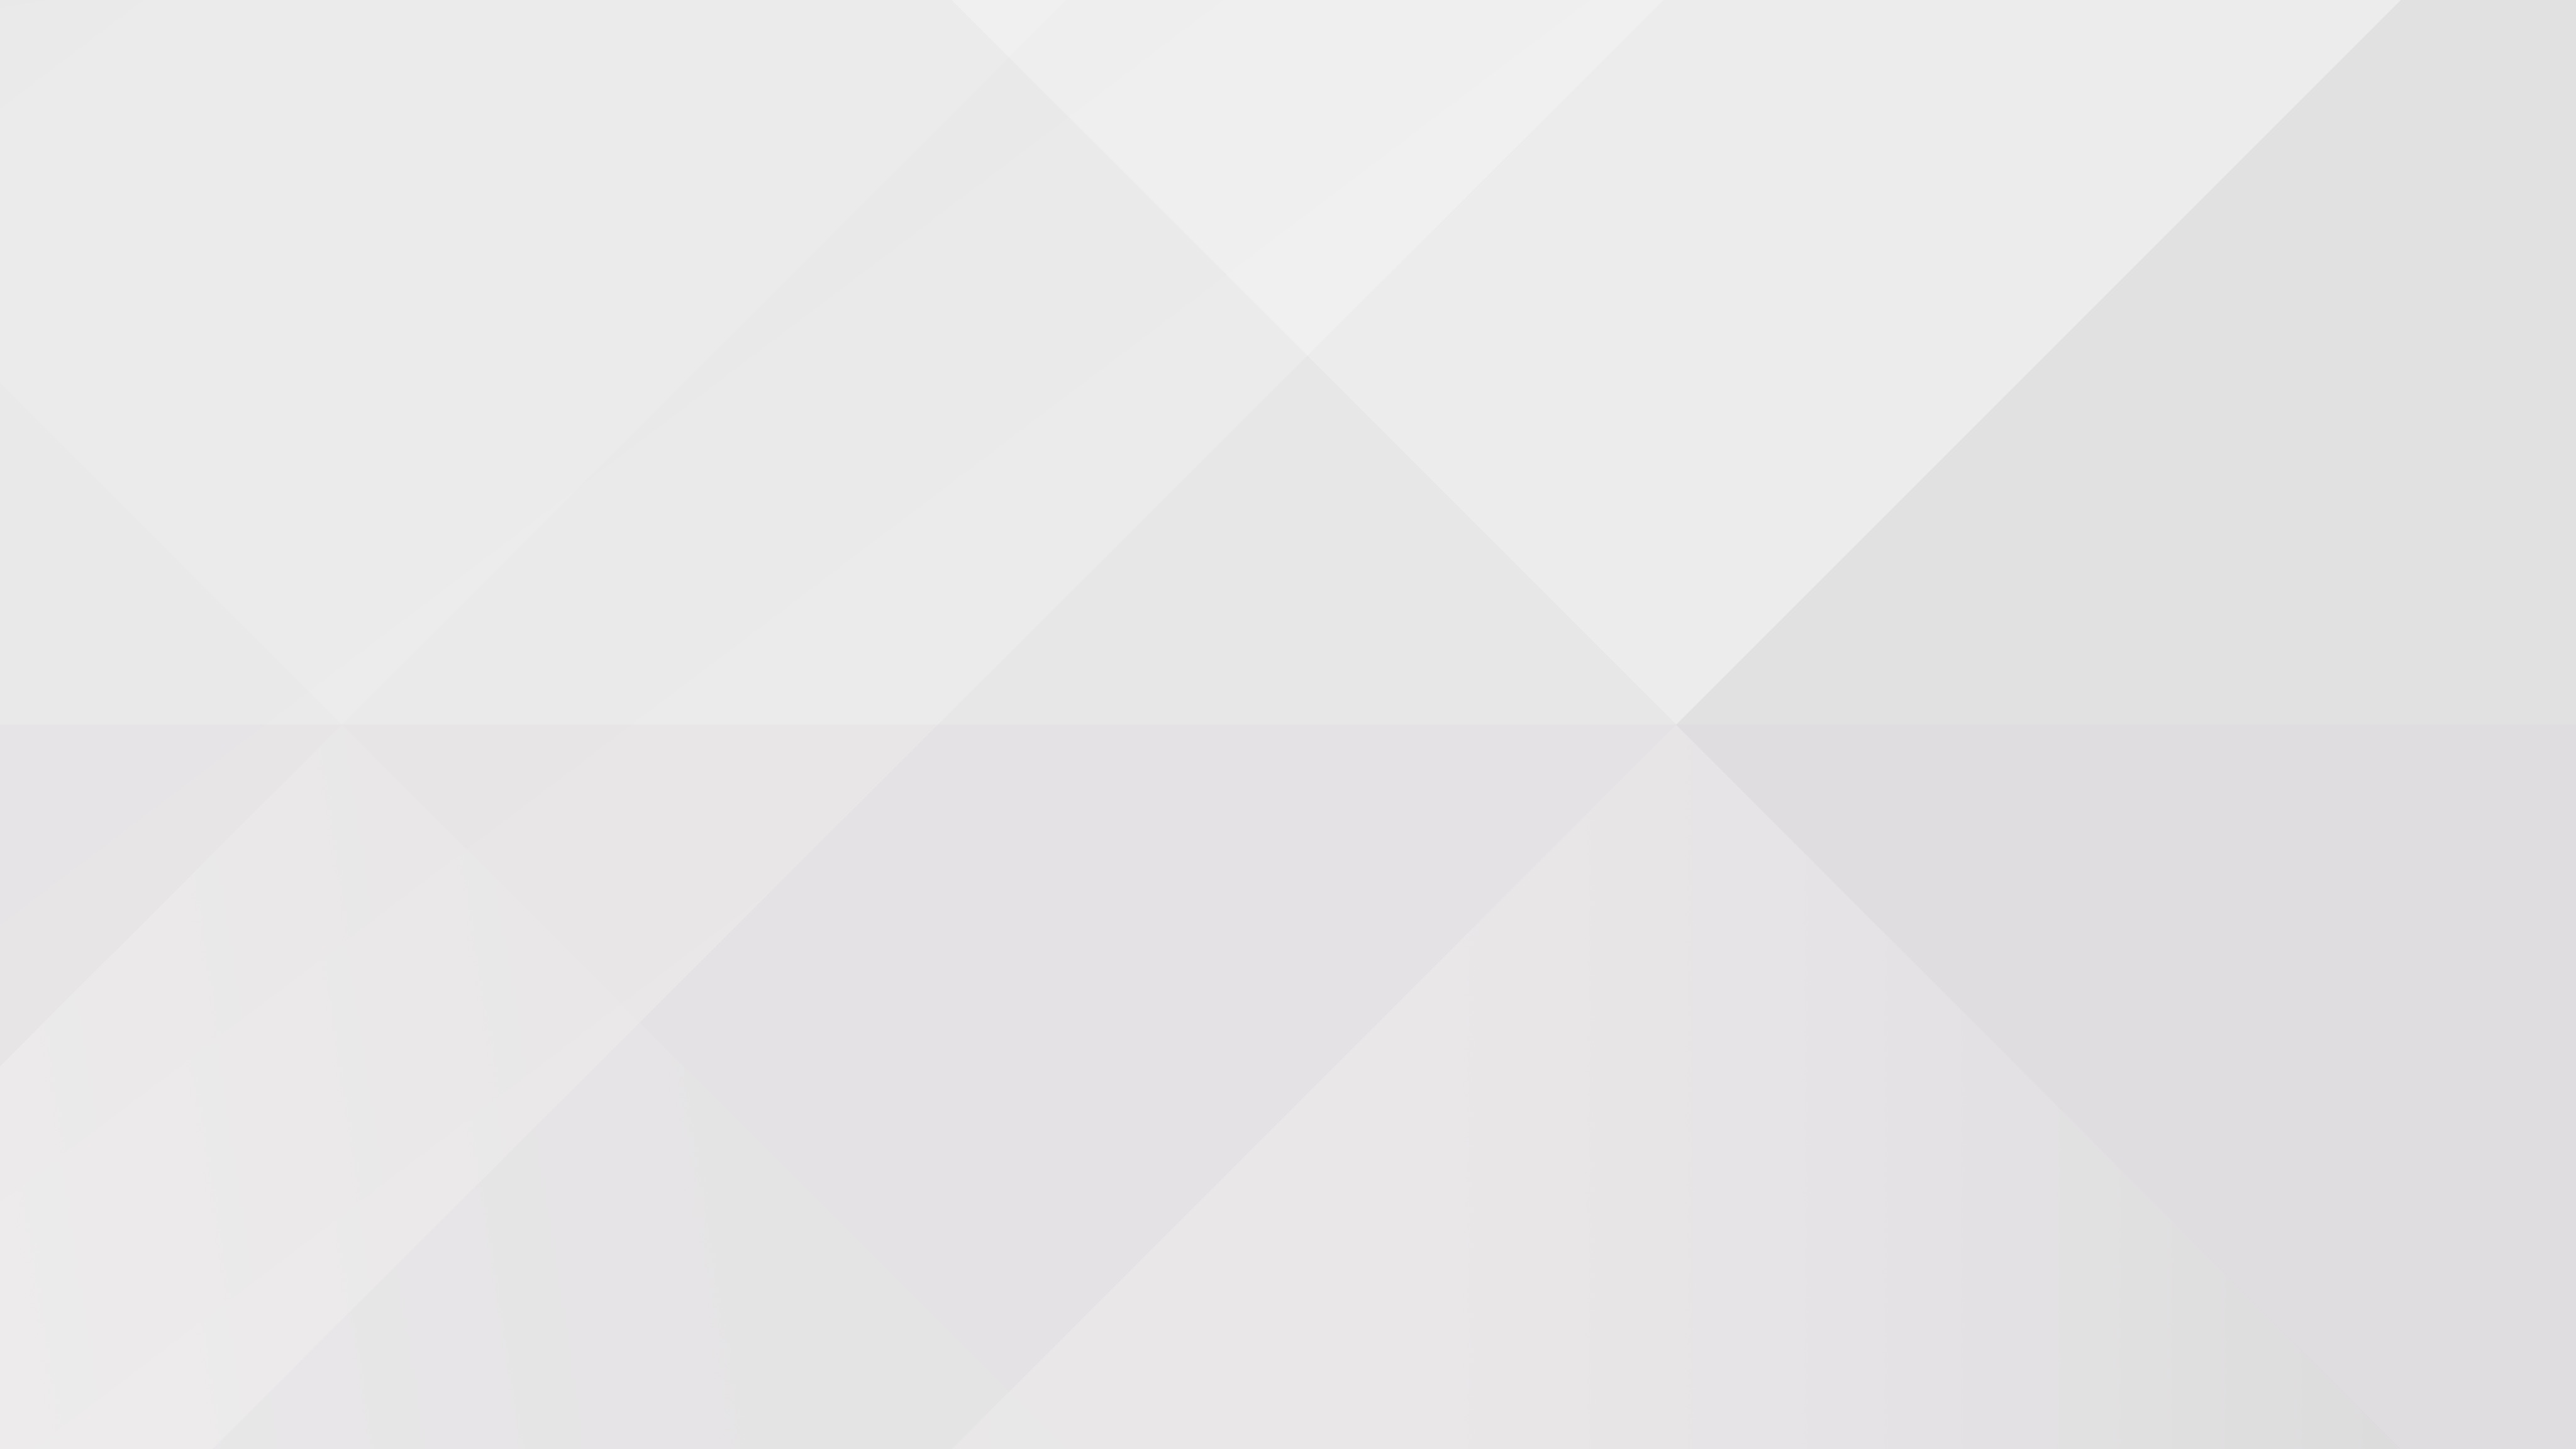 Fondos de pantalla Ubuntu 15 Vivid Vervet Greyscale